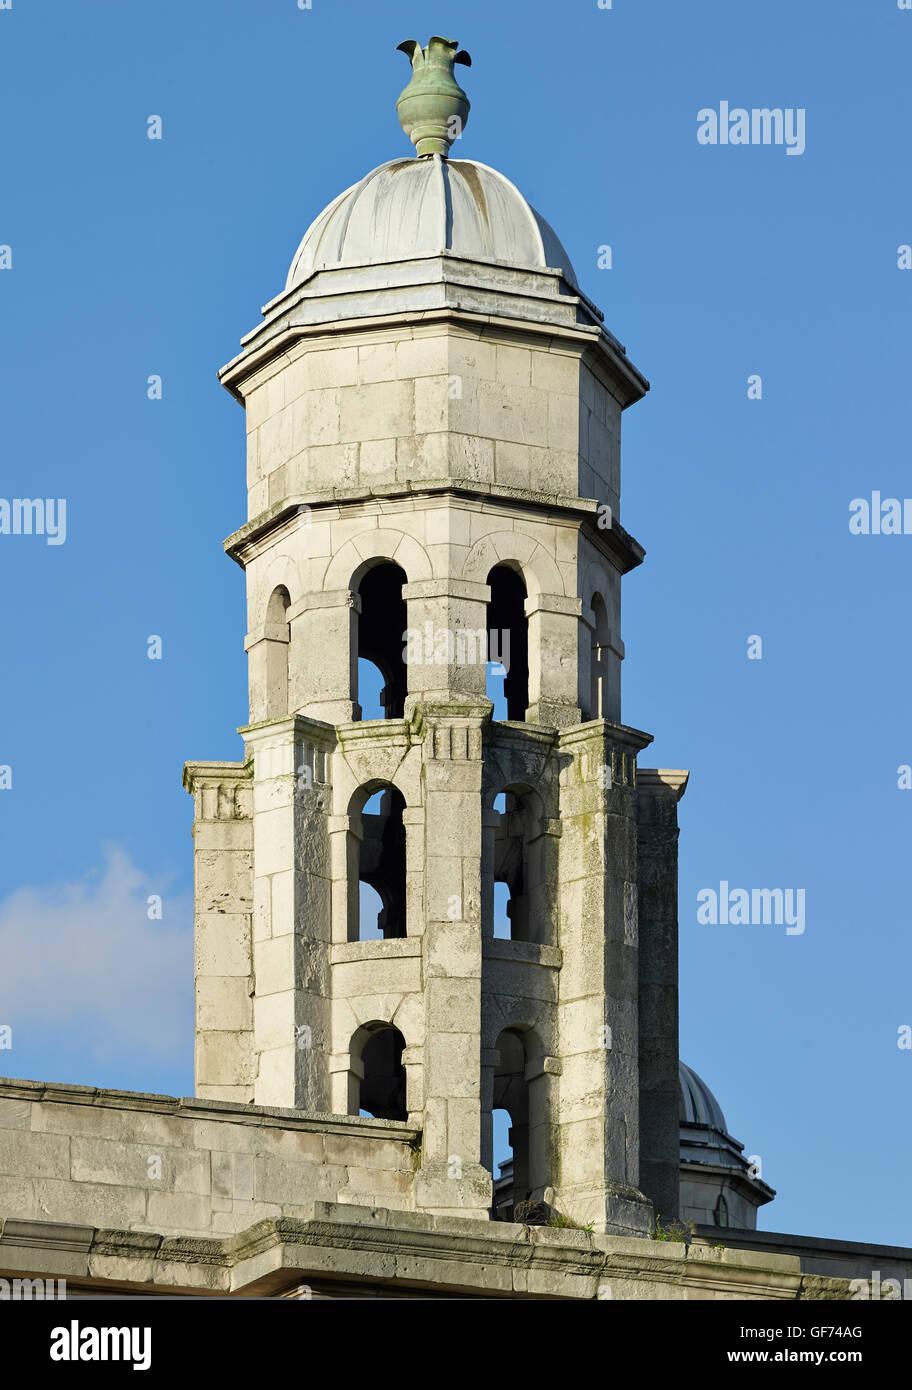 St George in-the-East, Stepney. Pepper pot; built by Nicholas Hawksmoor 1714 - 1729 - Stock Image